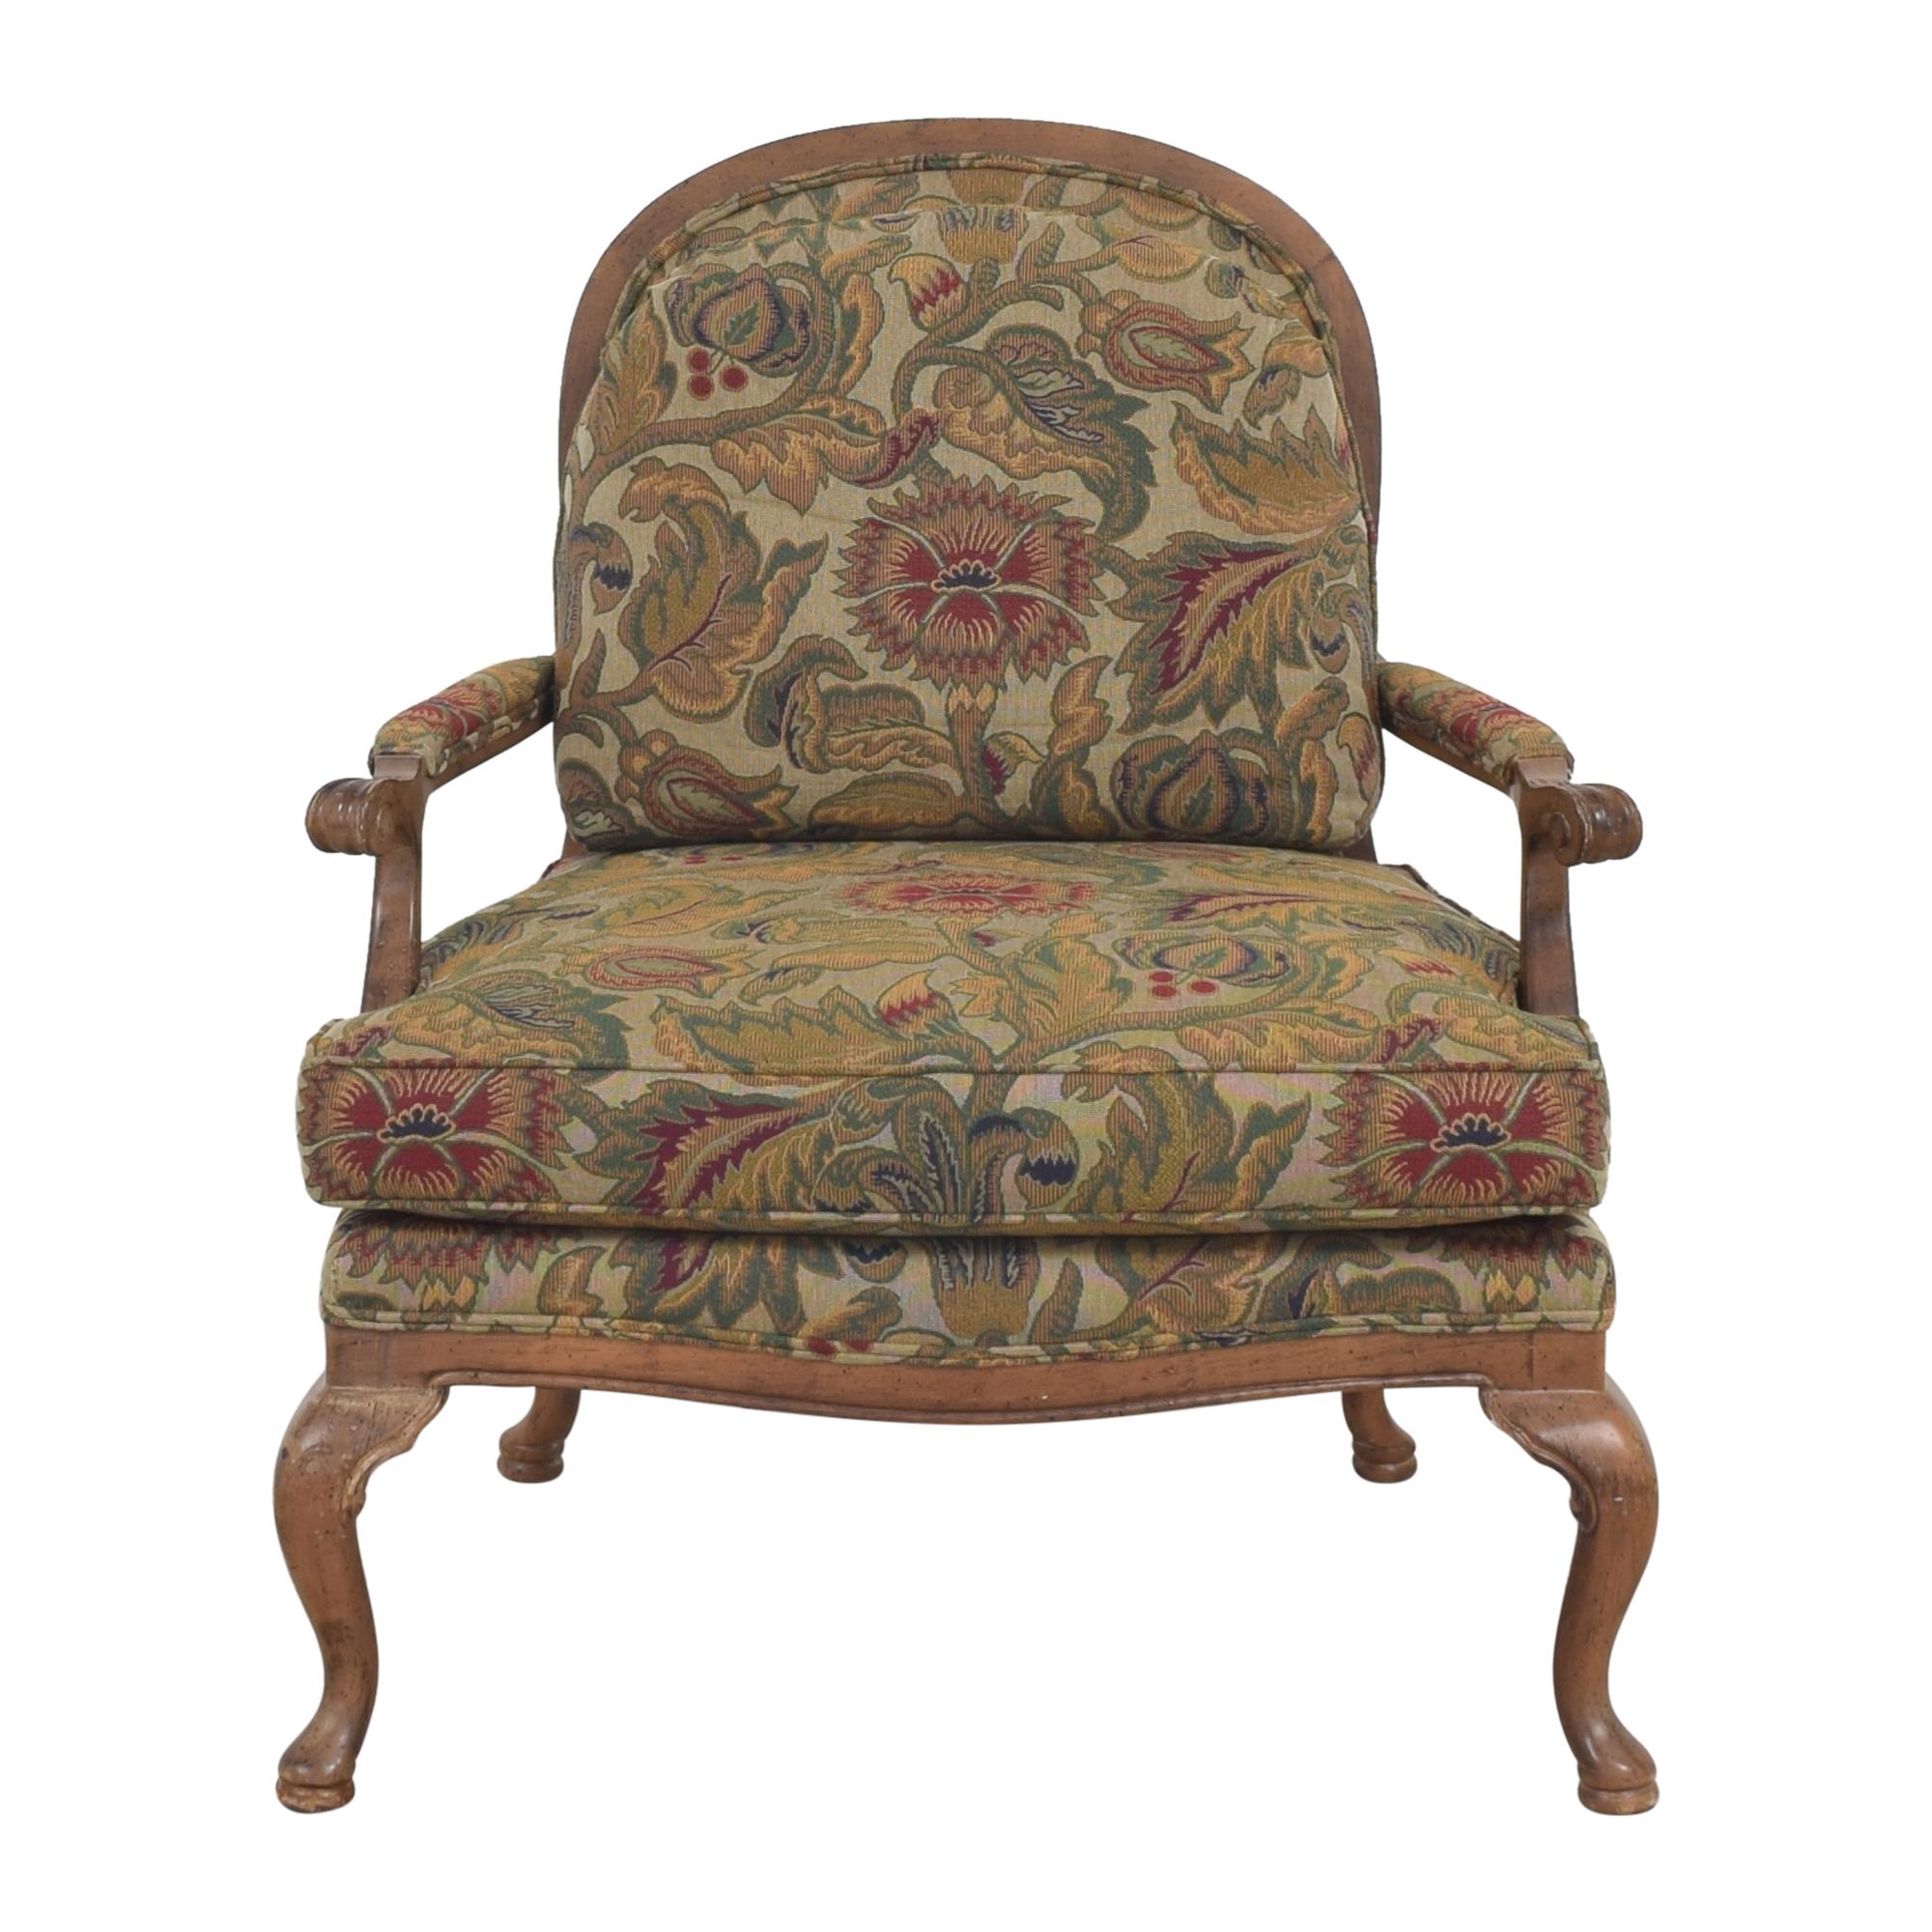 Thomasville Thomasville Bergere Chair and Ottoman nj